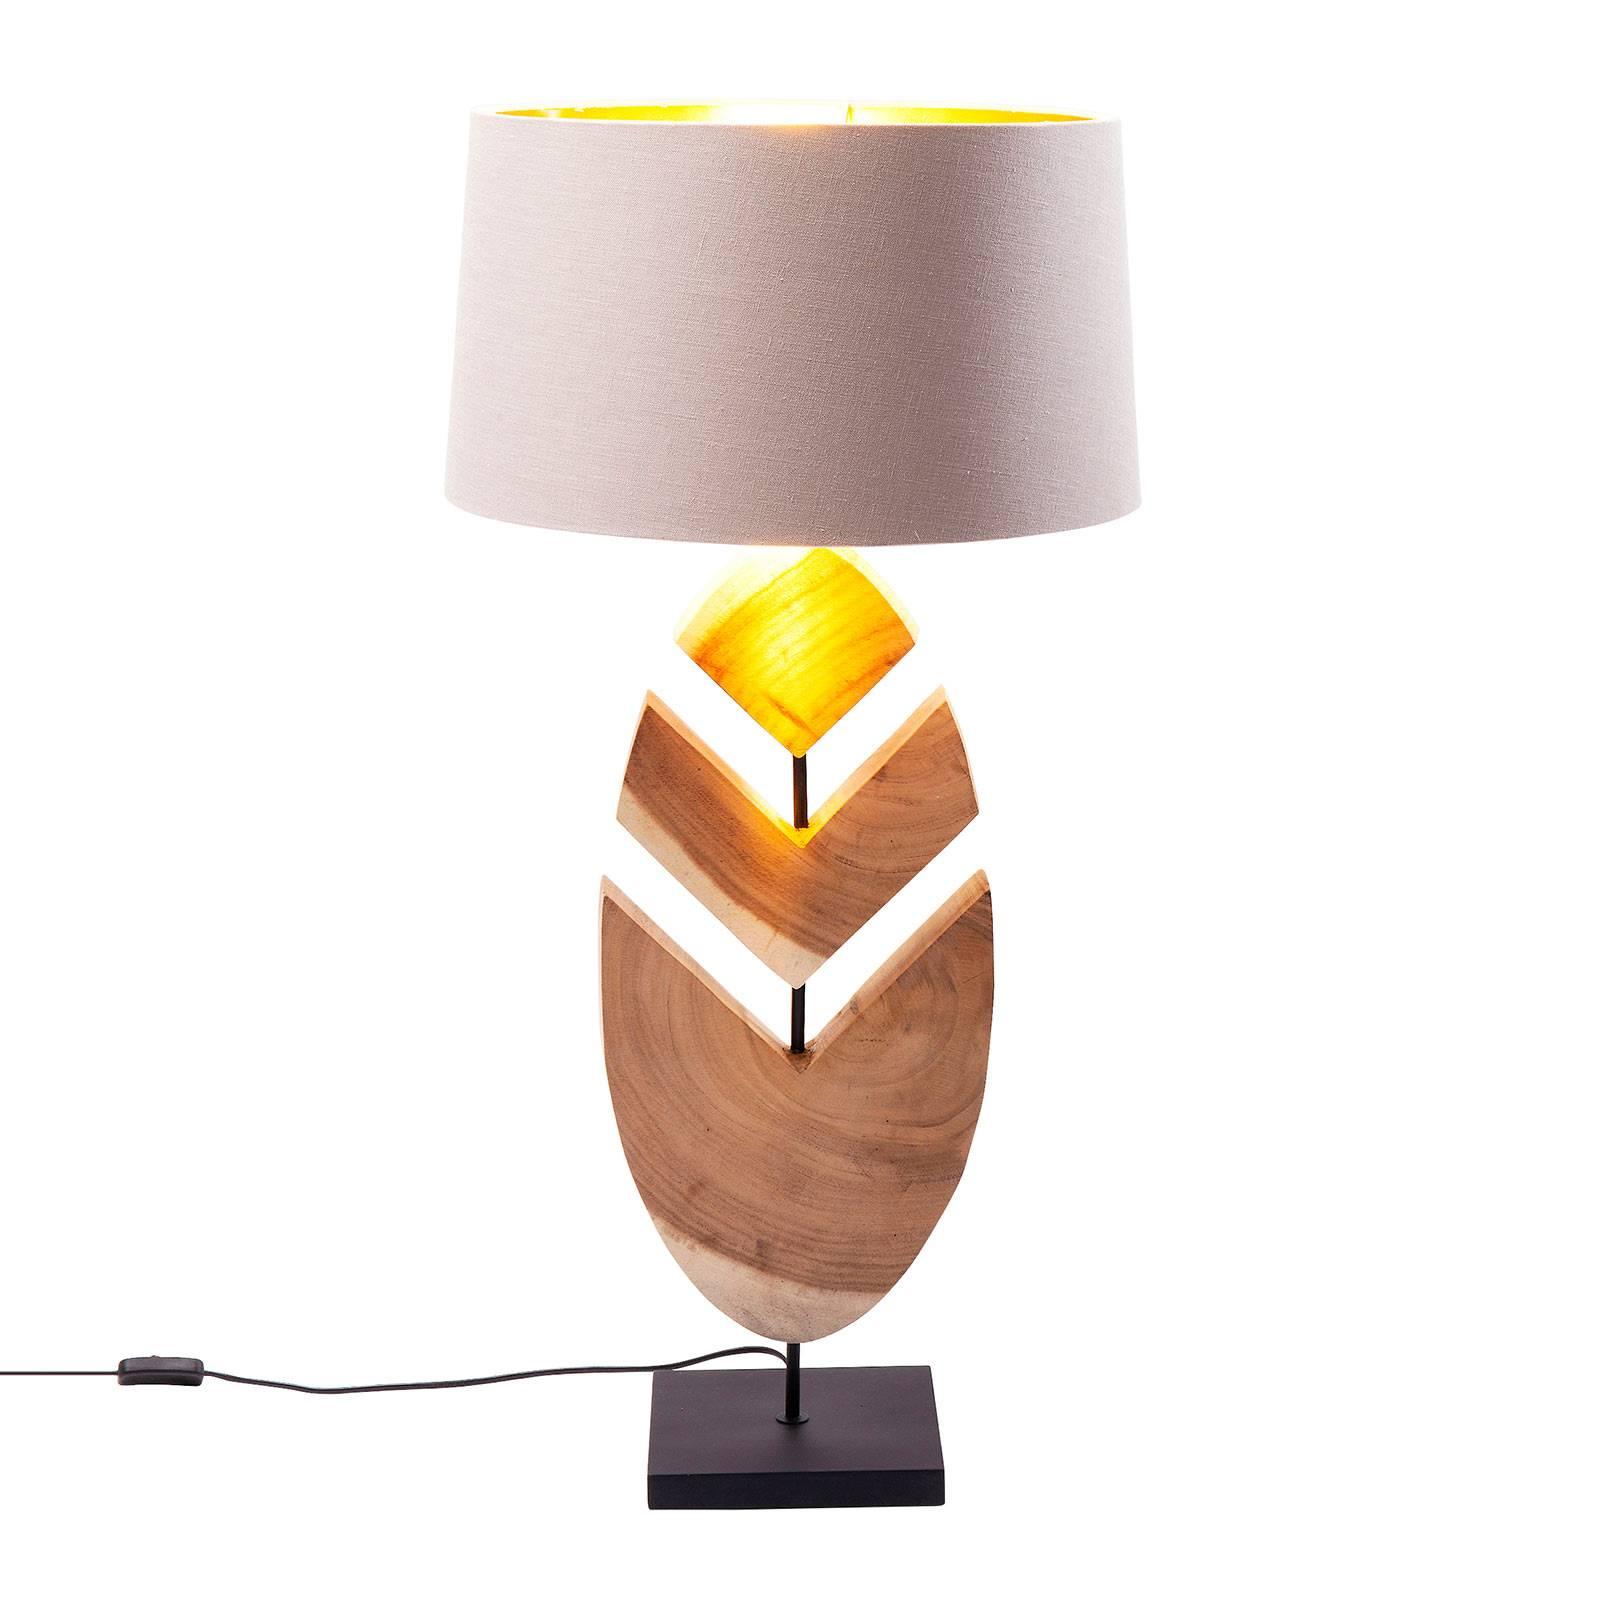 KARE Feather tafellamp met acaciahout